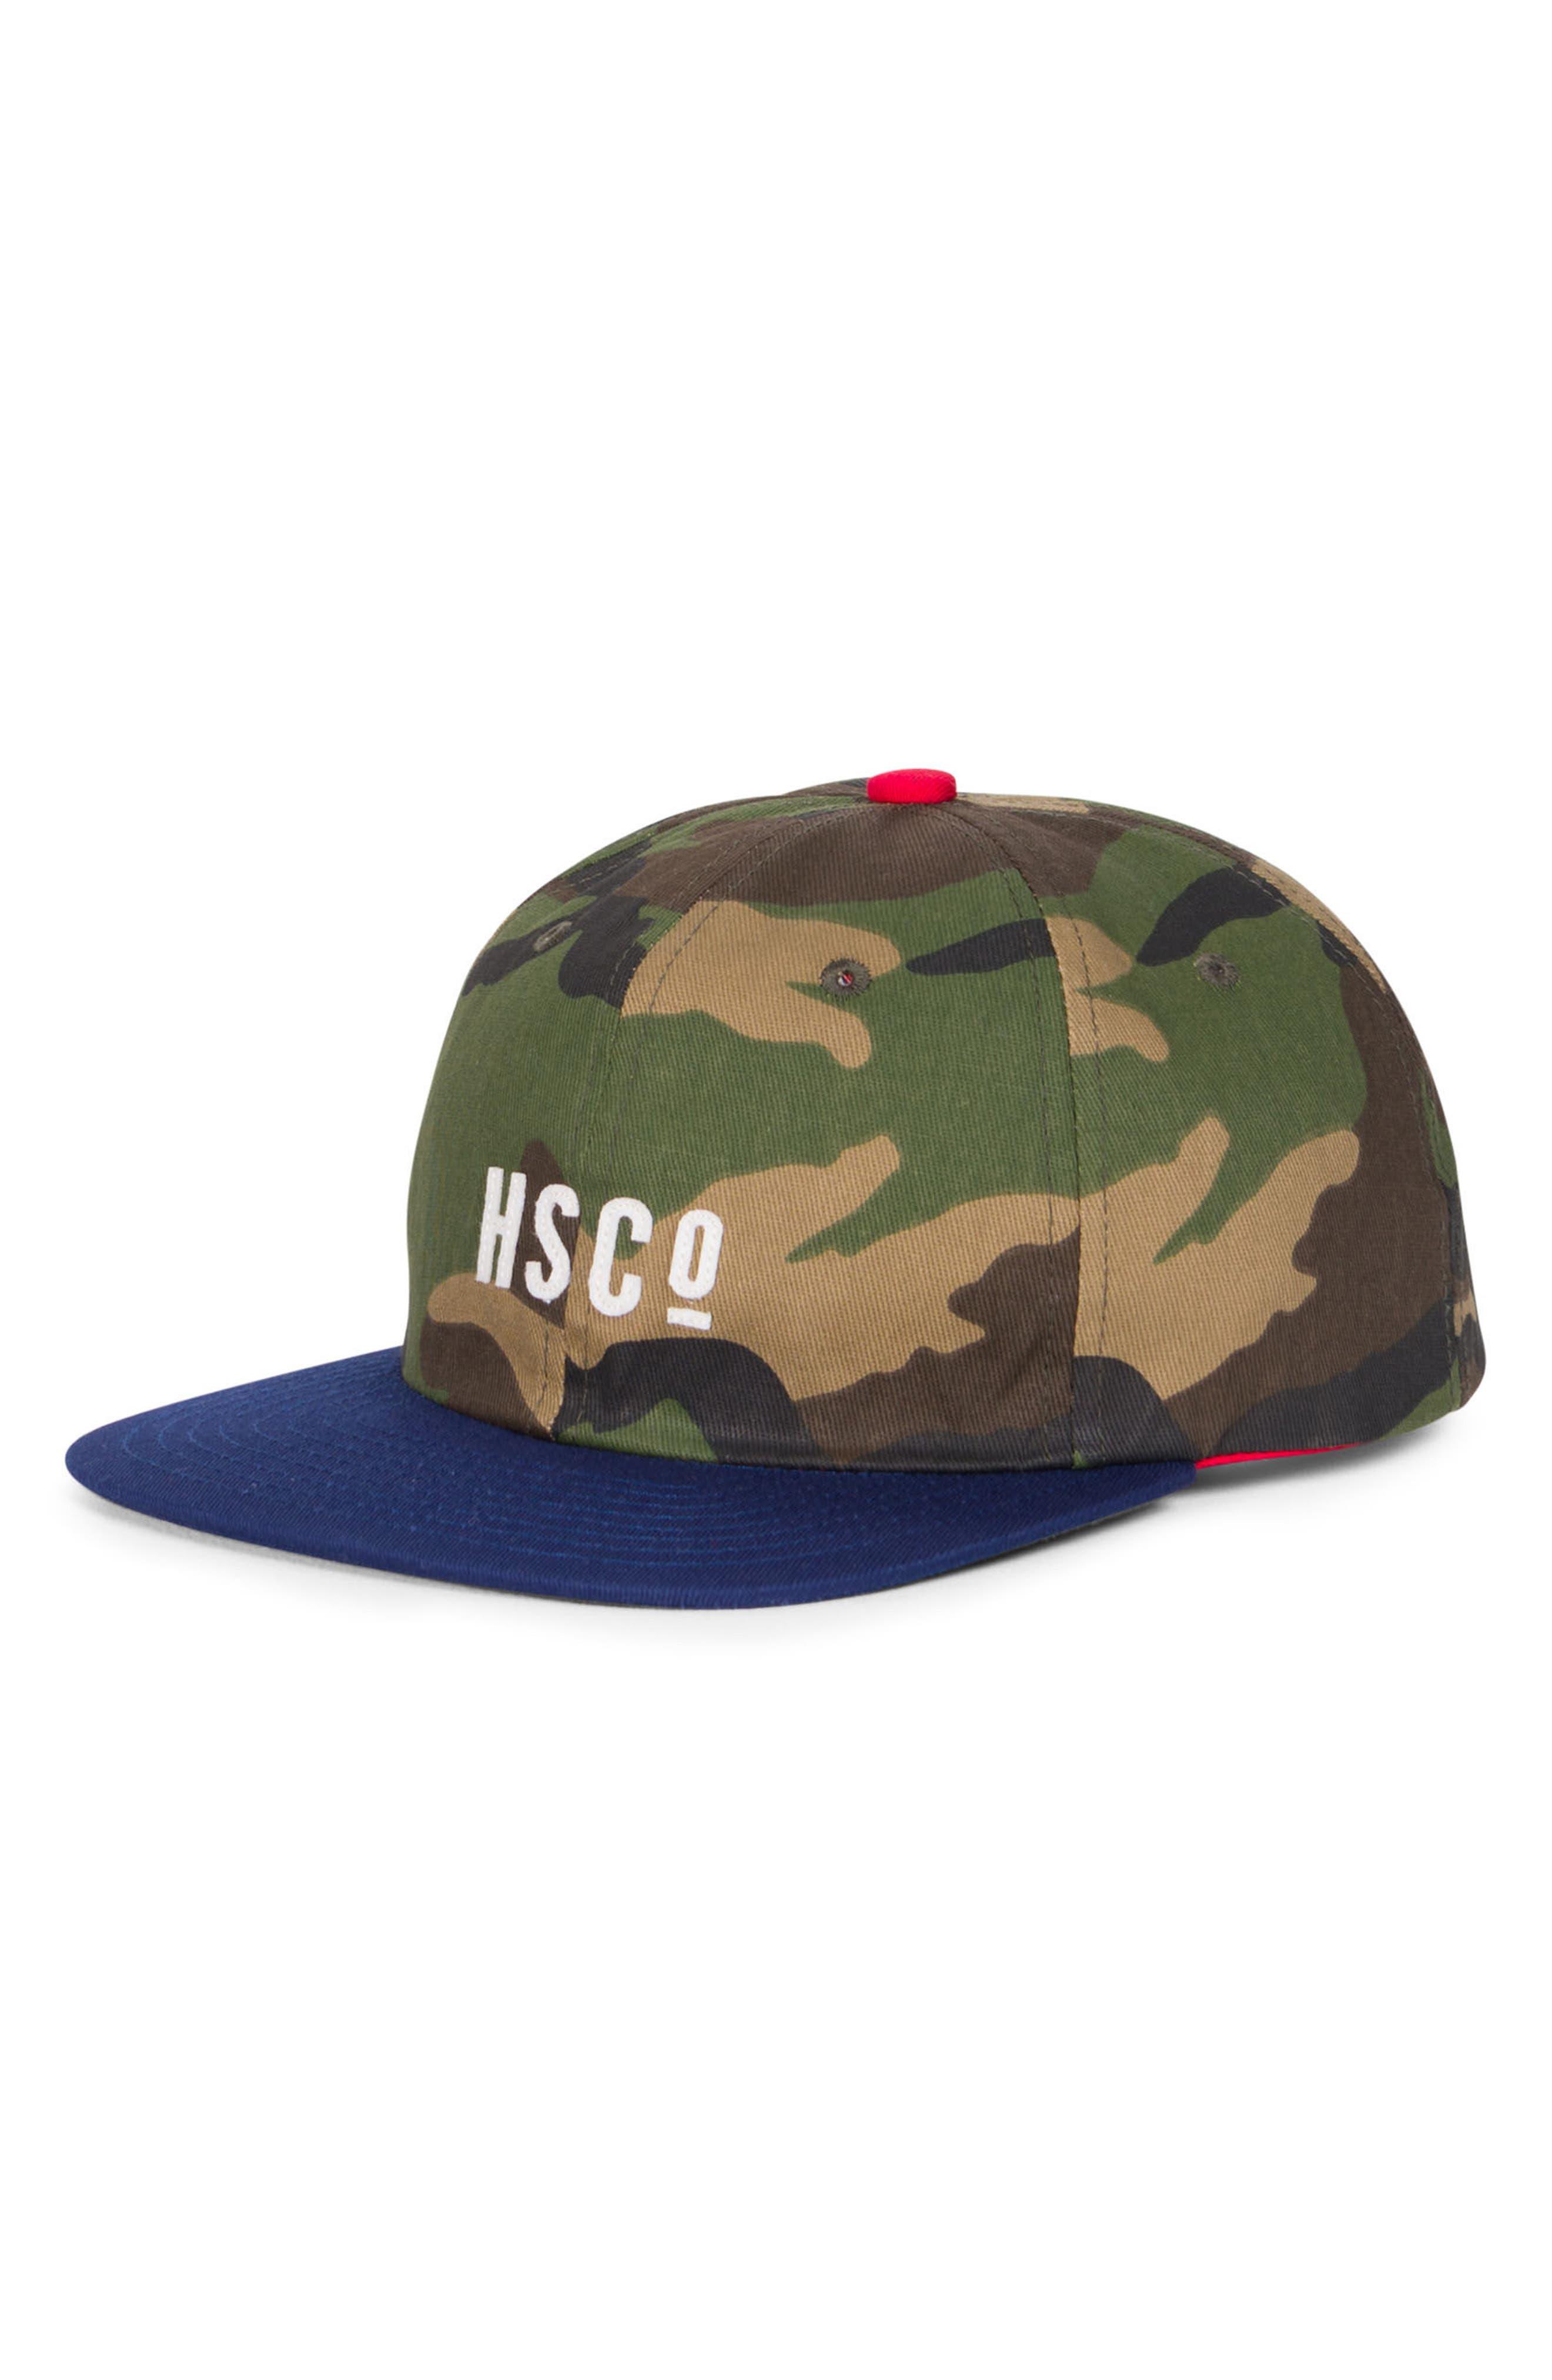 Mosby Camo Snapback Baseball Cap,                         Main,                         color, Woodland Camo/ Navy/ Red